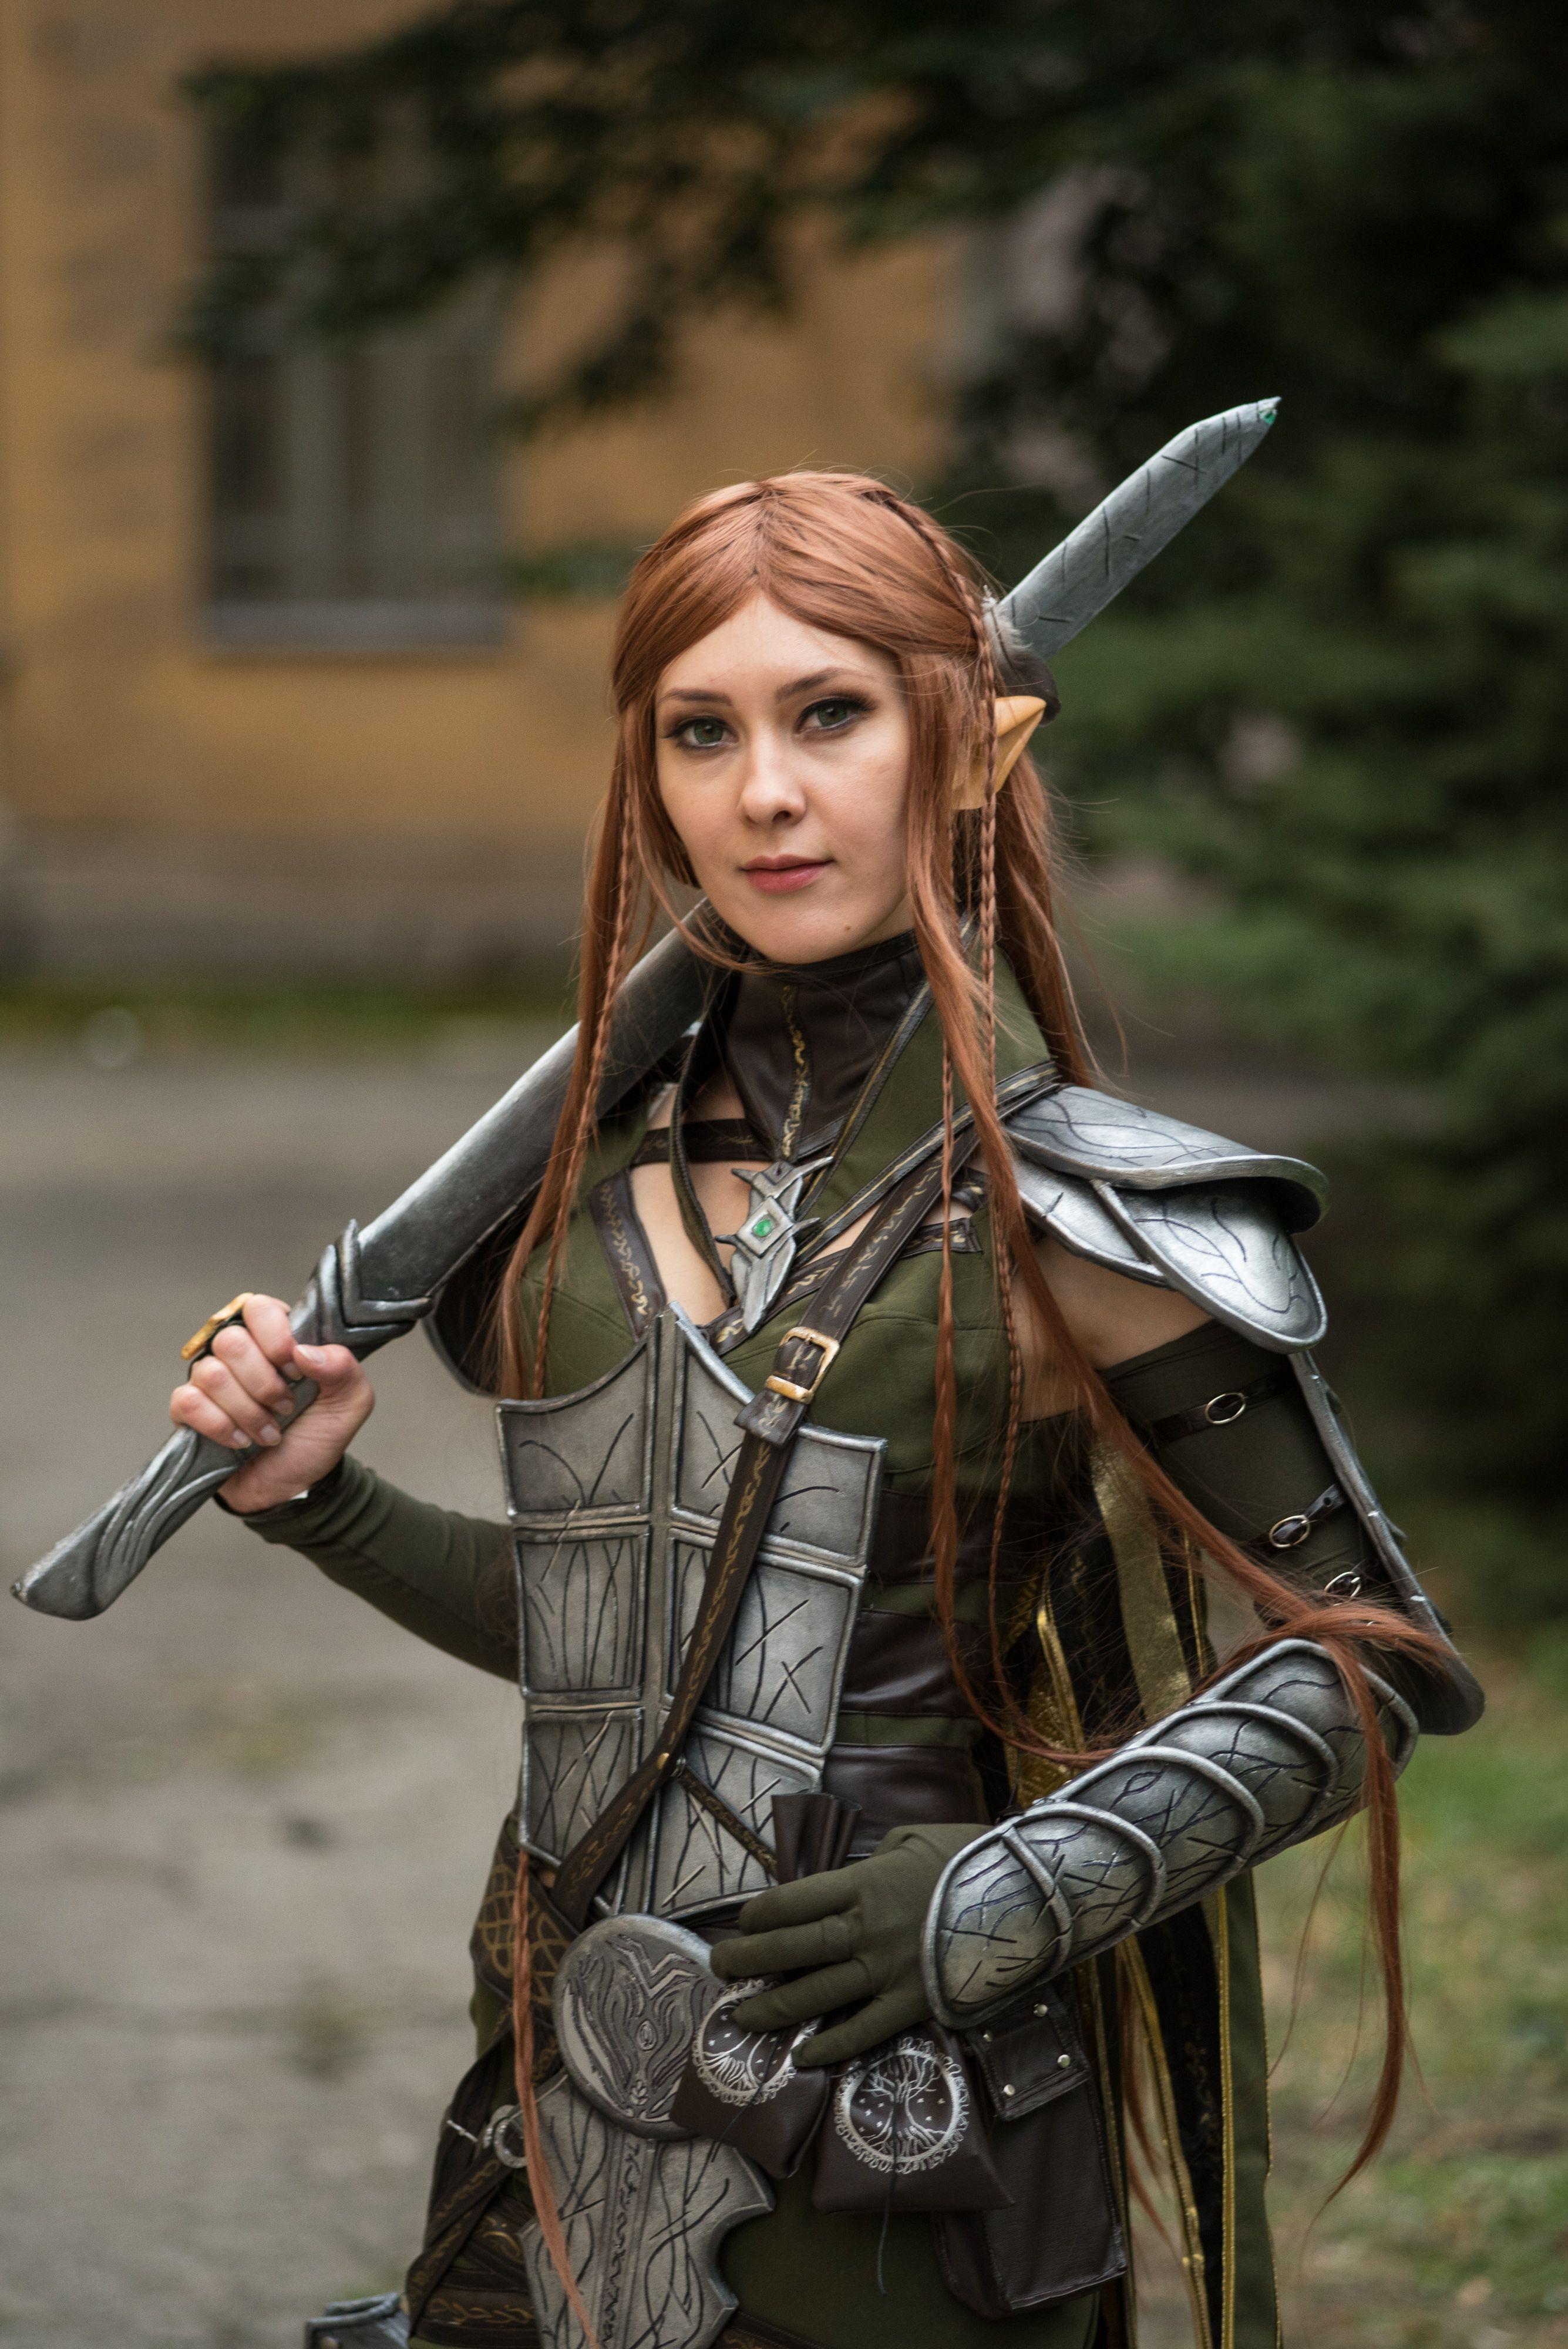 Skyrim High Elf Cosplay Costume Skyrim Cosplay Armor Tes Etsy Elf Cosplay Skyrim Cosplay High Elf